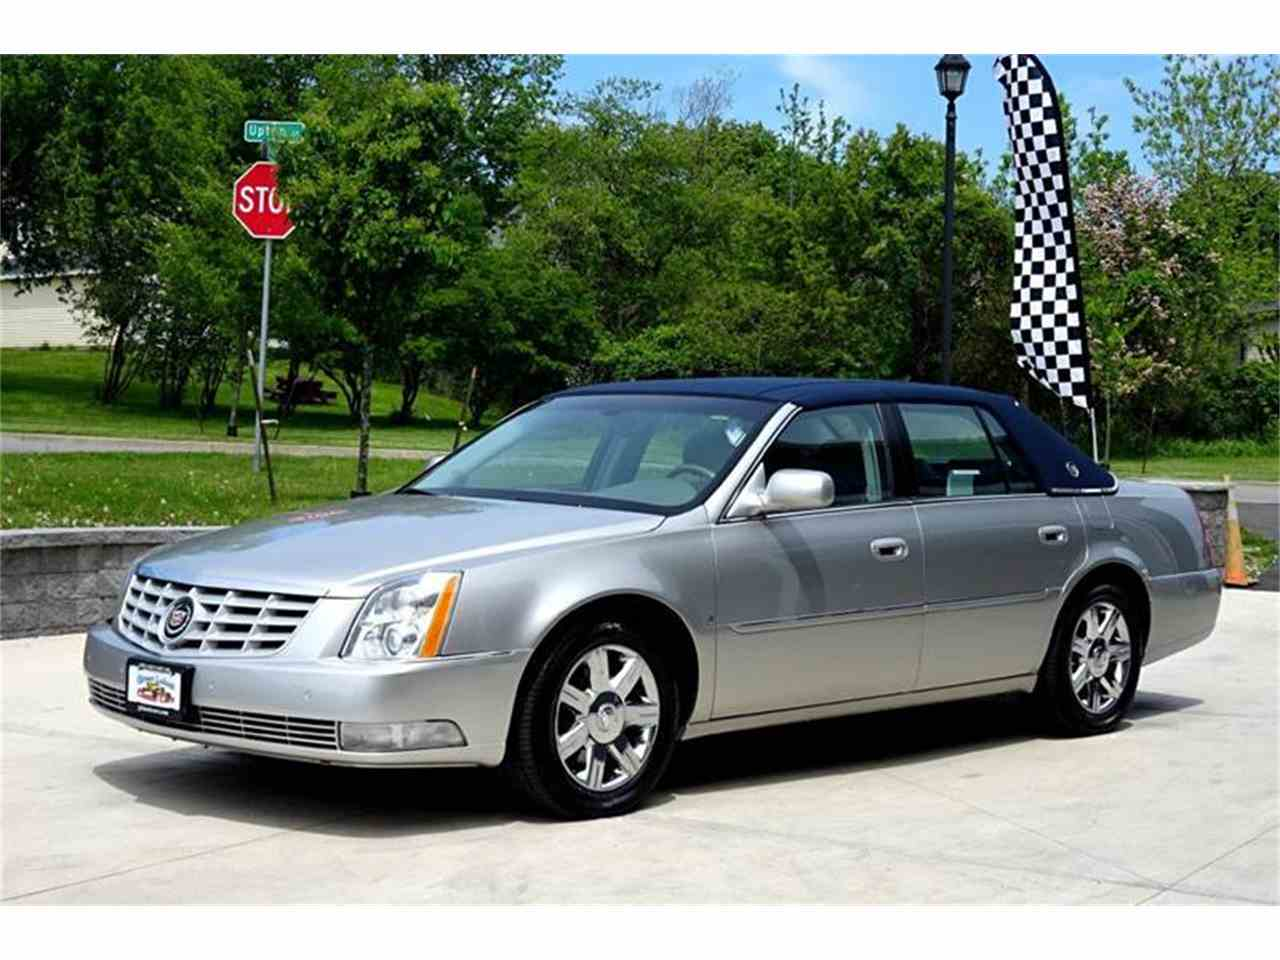 2006 Cadillac DTS for Sale - CC-986312